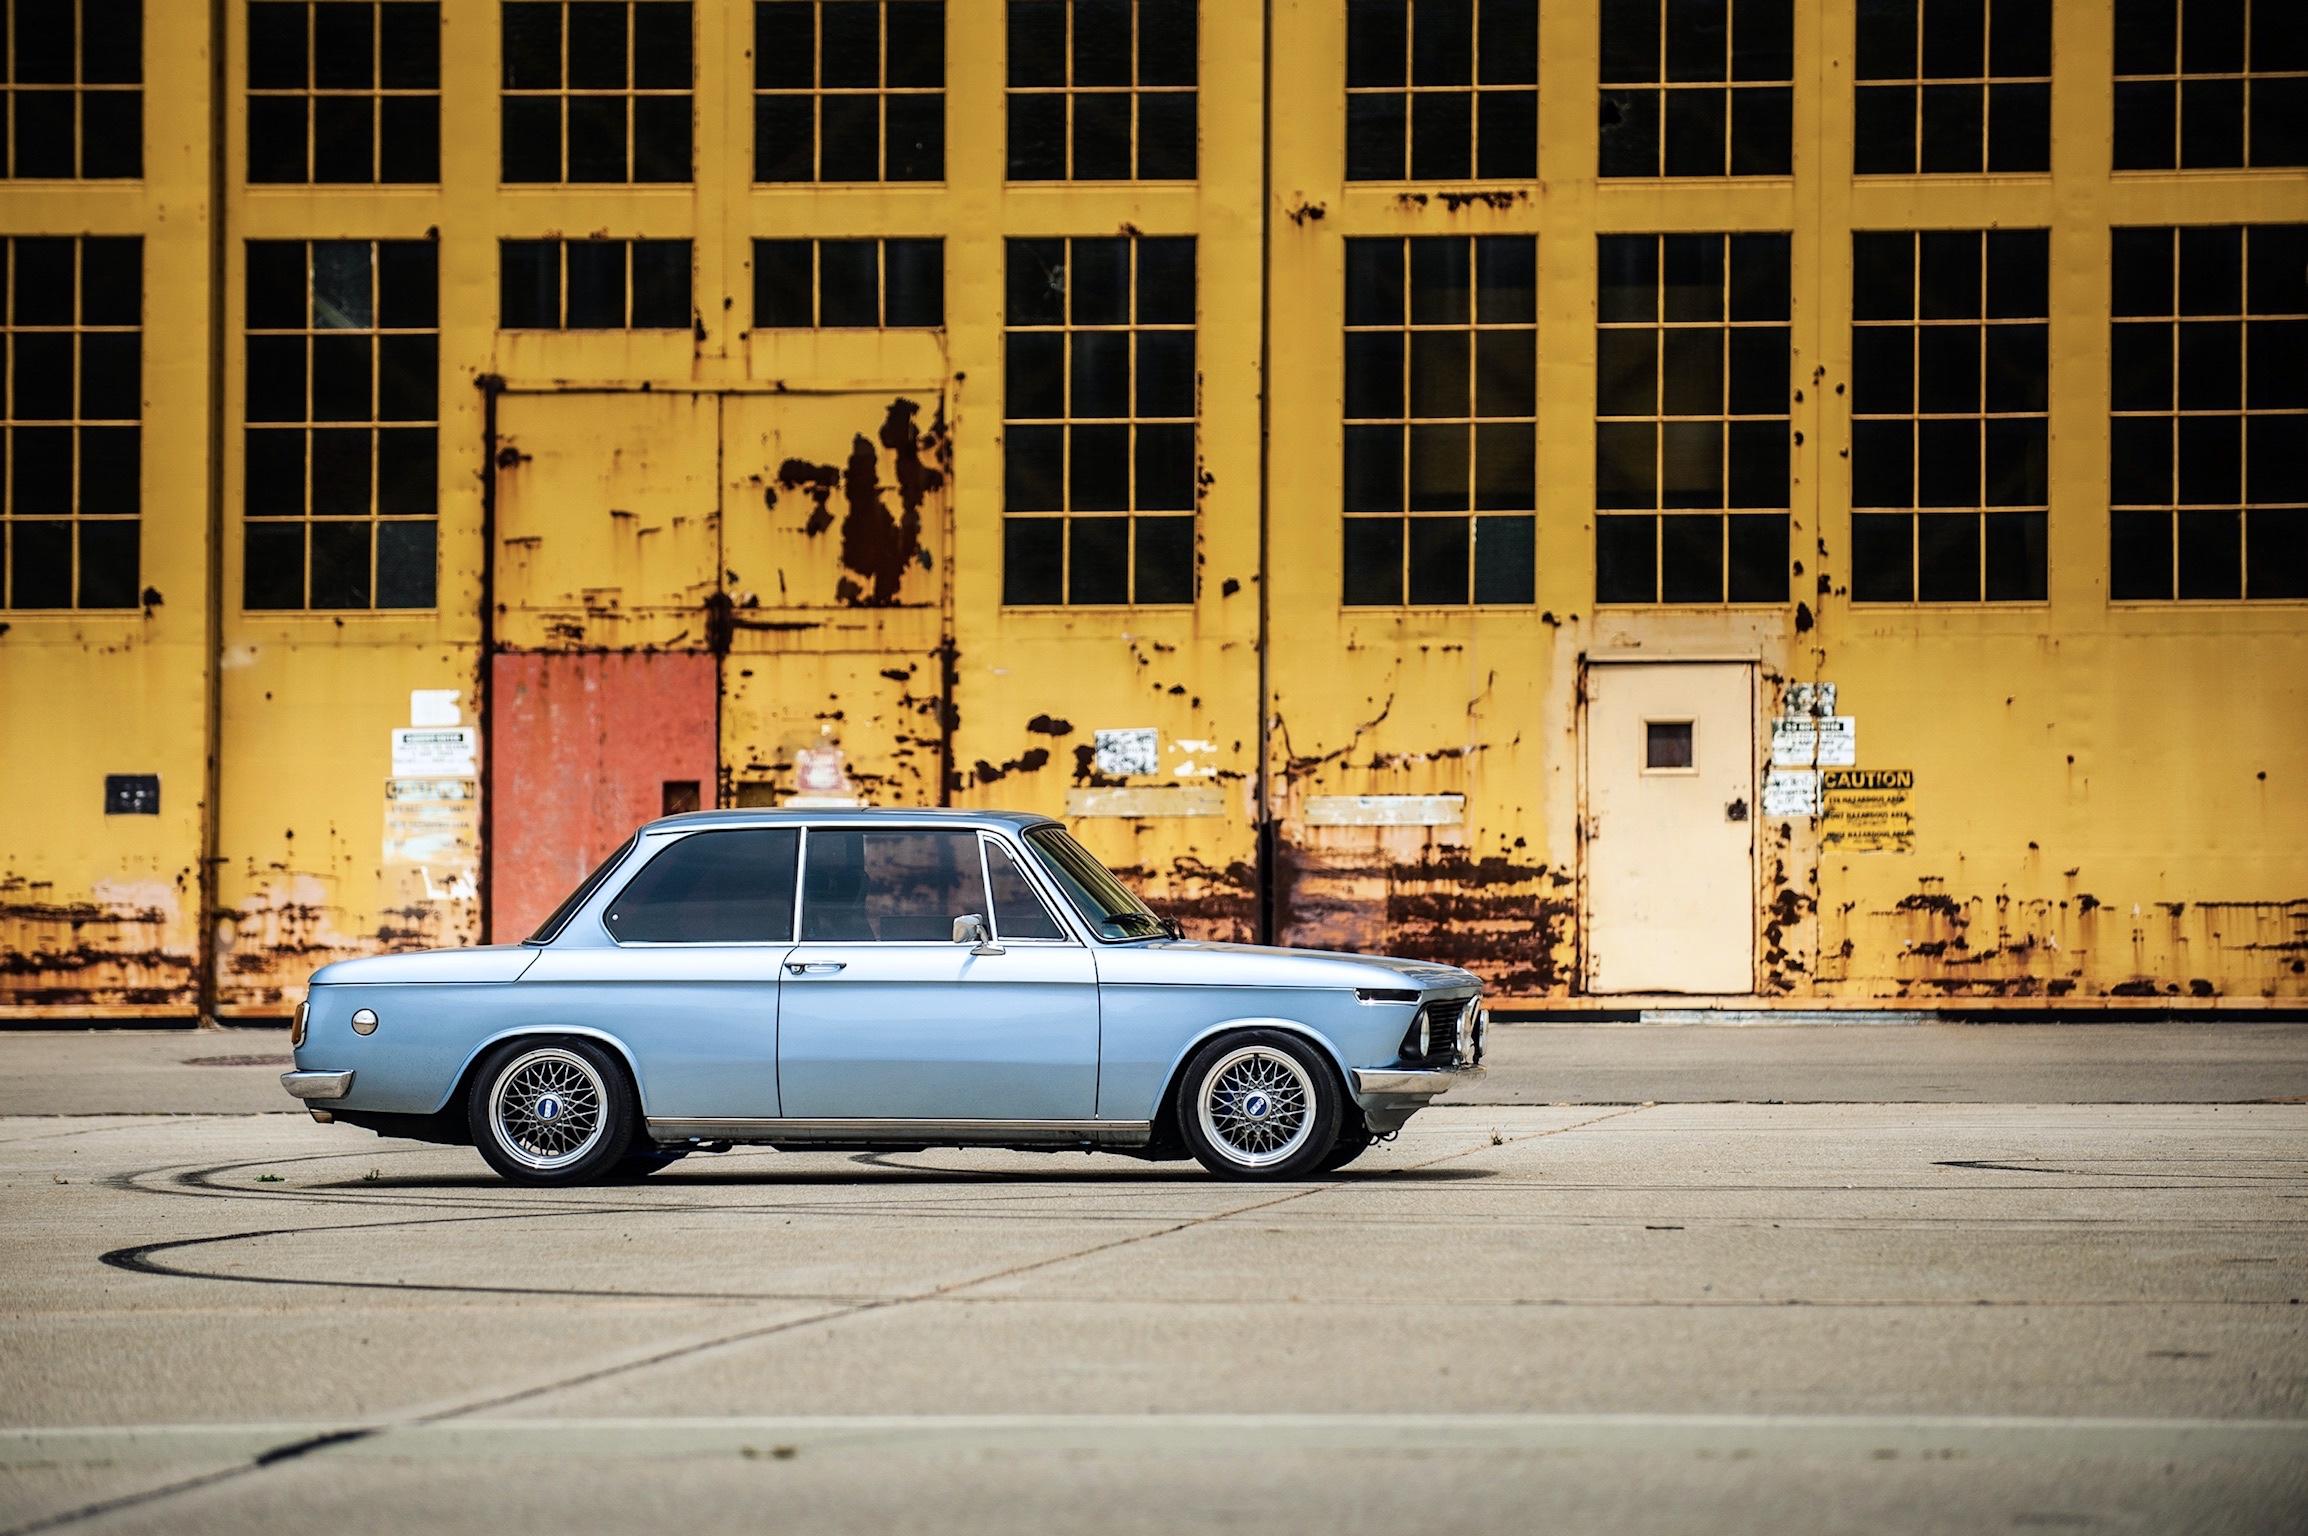 BMW, BMW 2002, Vintage, project2002, project2002.com, BBS, Fjord, fjord blue, 1976, e10, m10, restoration, restored, nikon d700